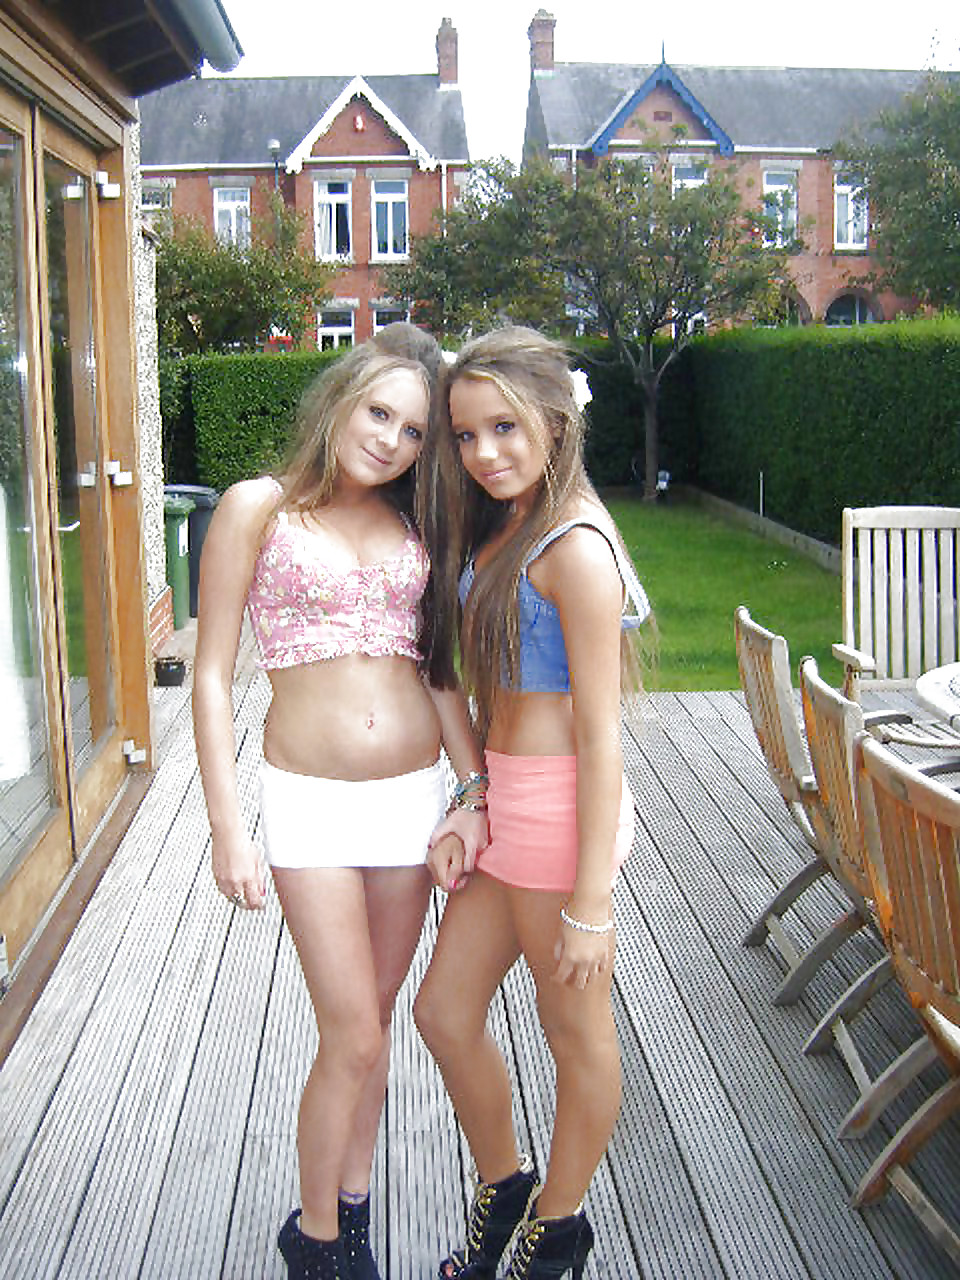 Boobs nasty little teen sluts porn aisan girls